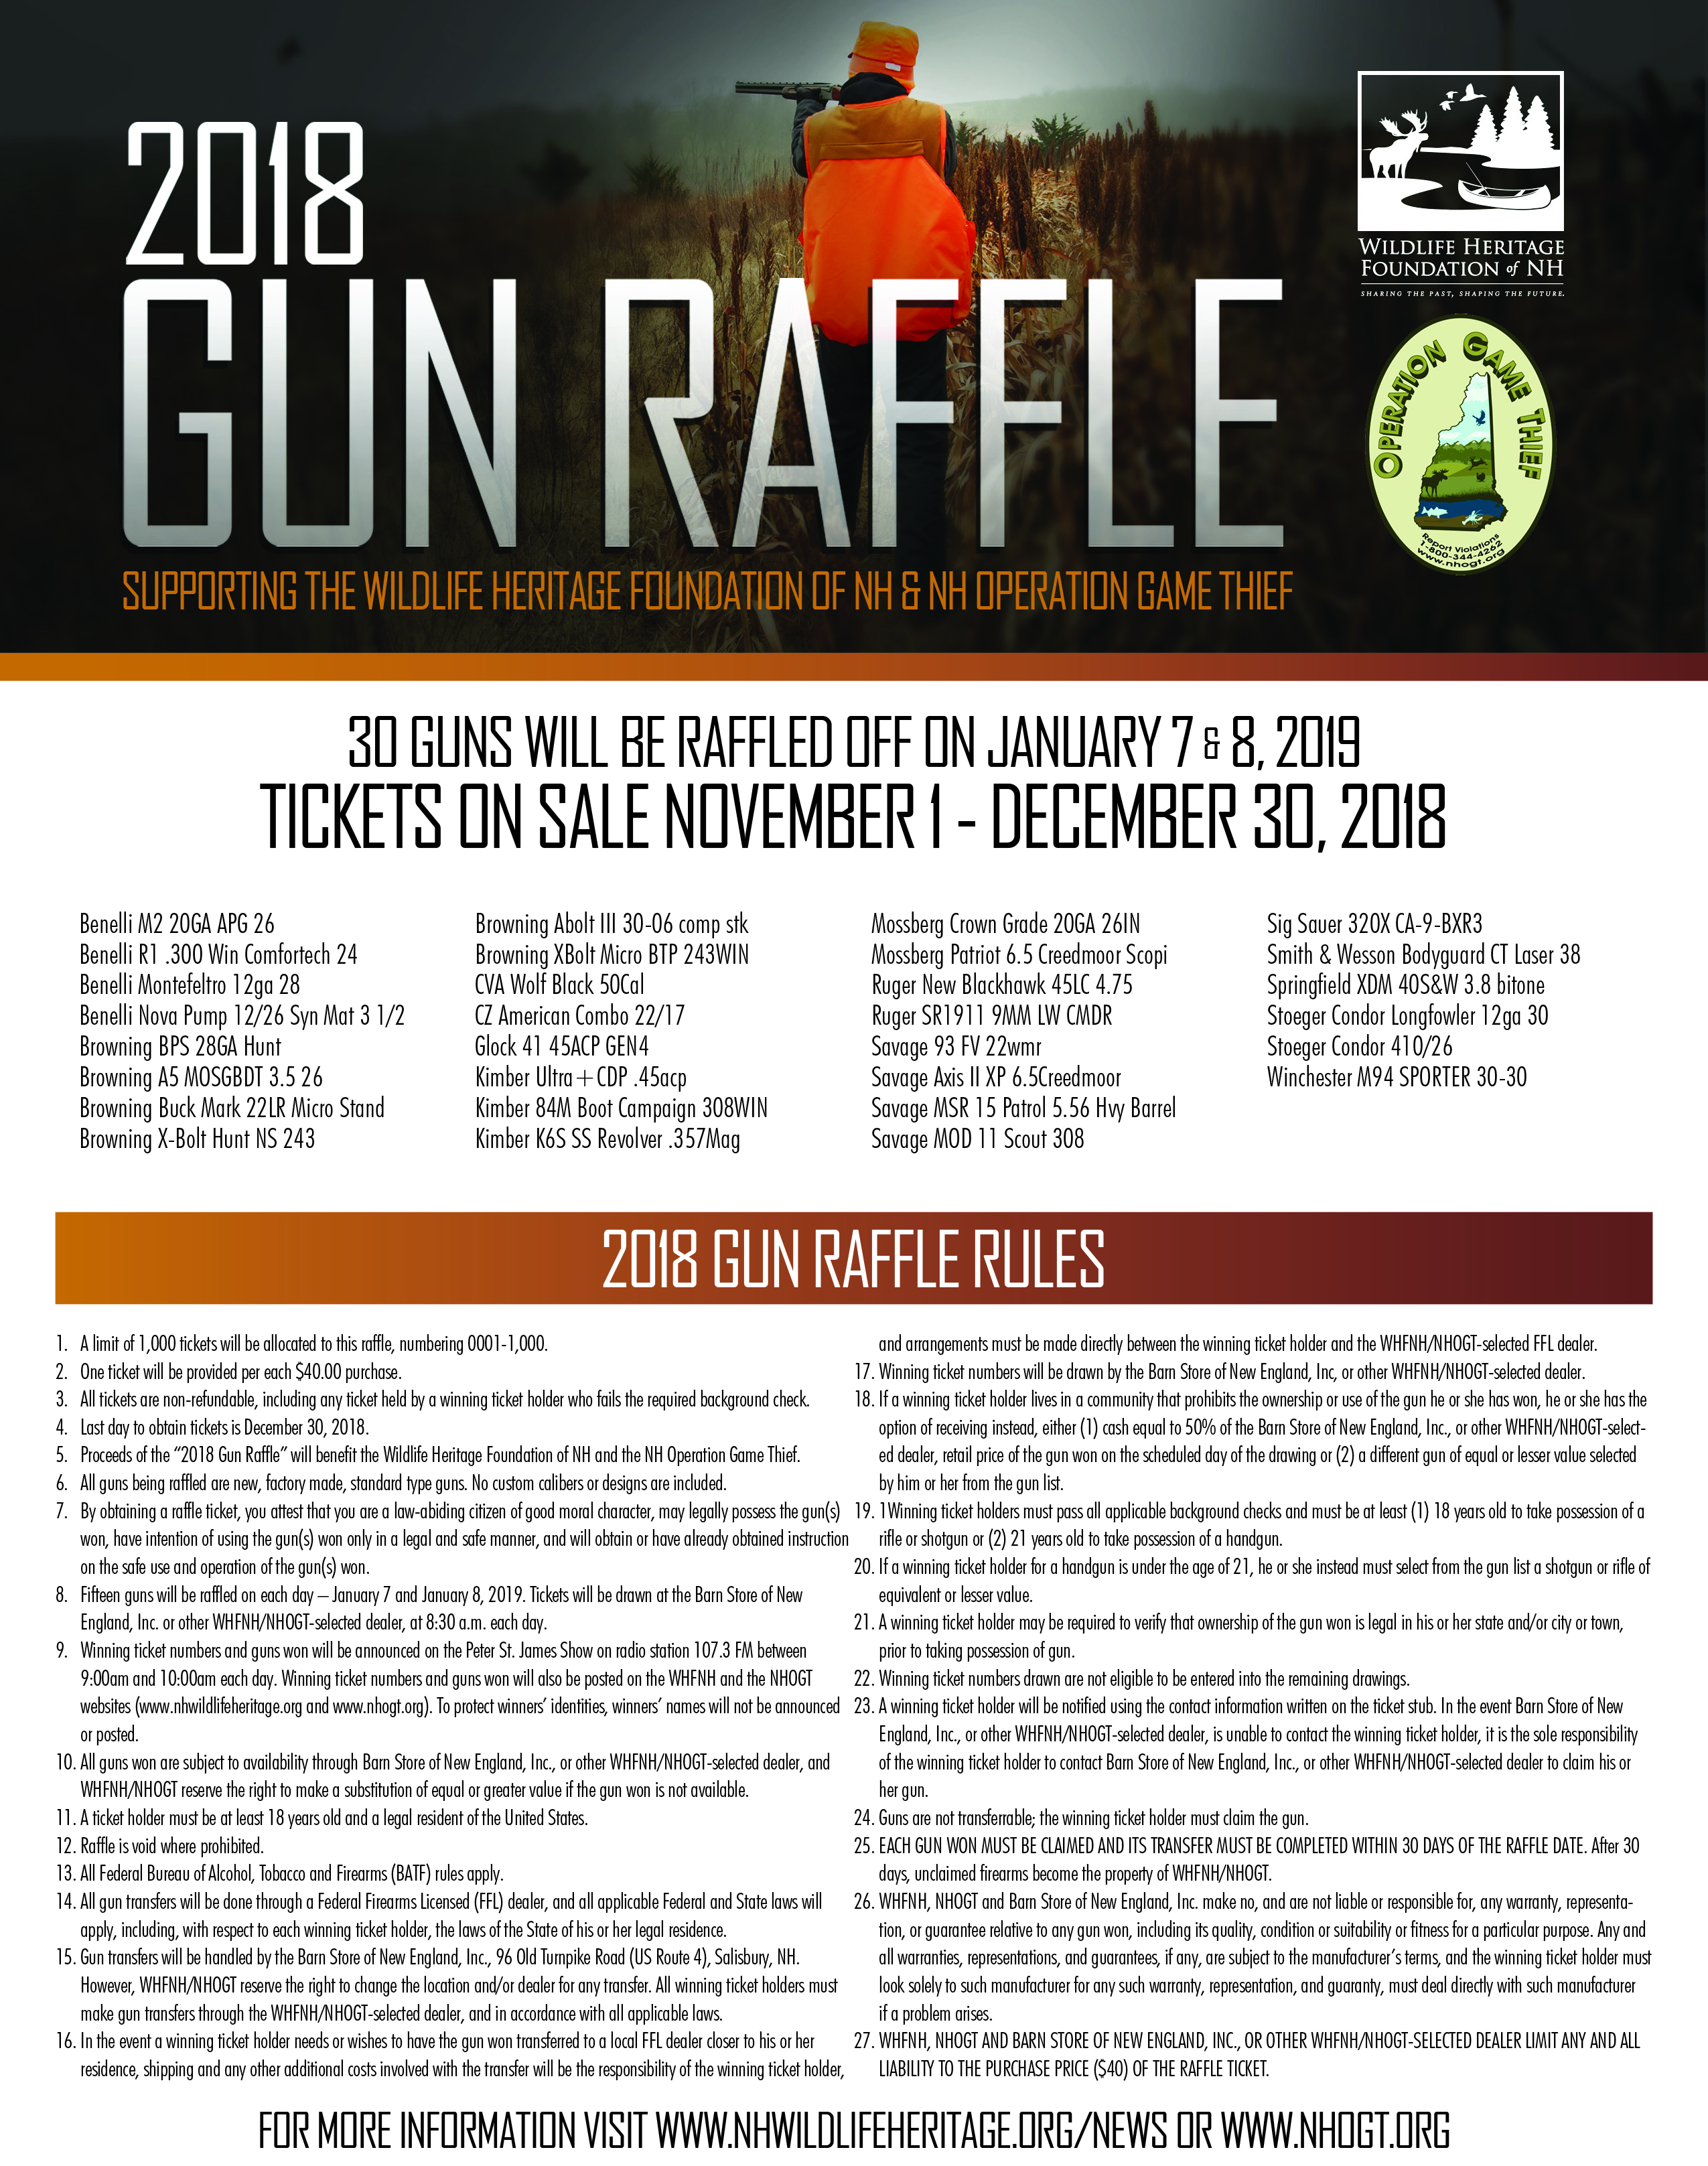 gun raffle tickets - Suzen rabionetassociats com